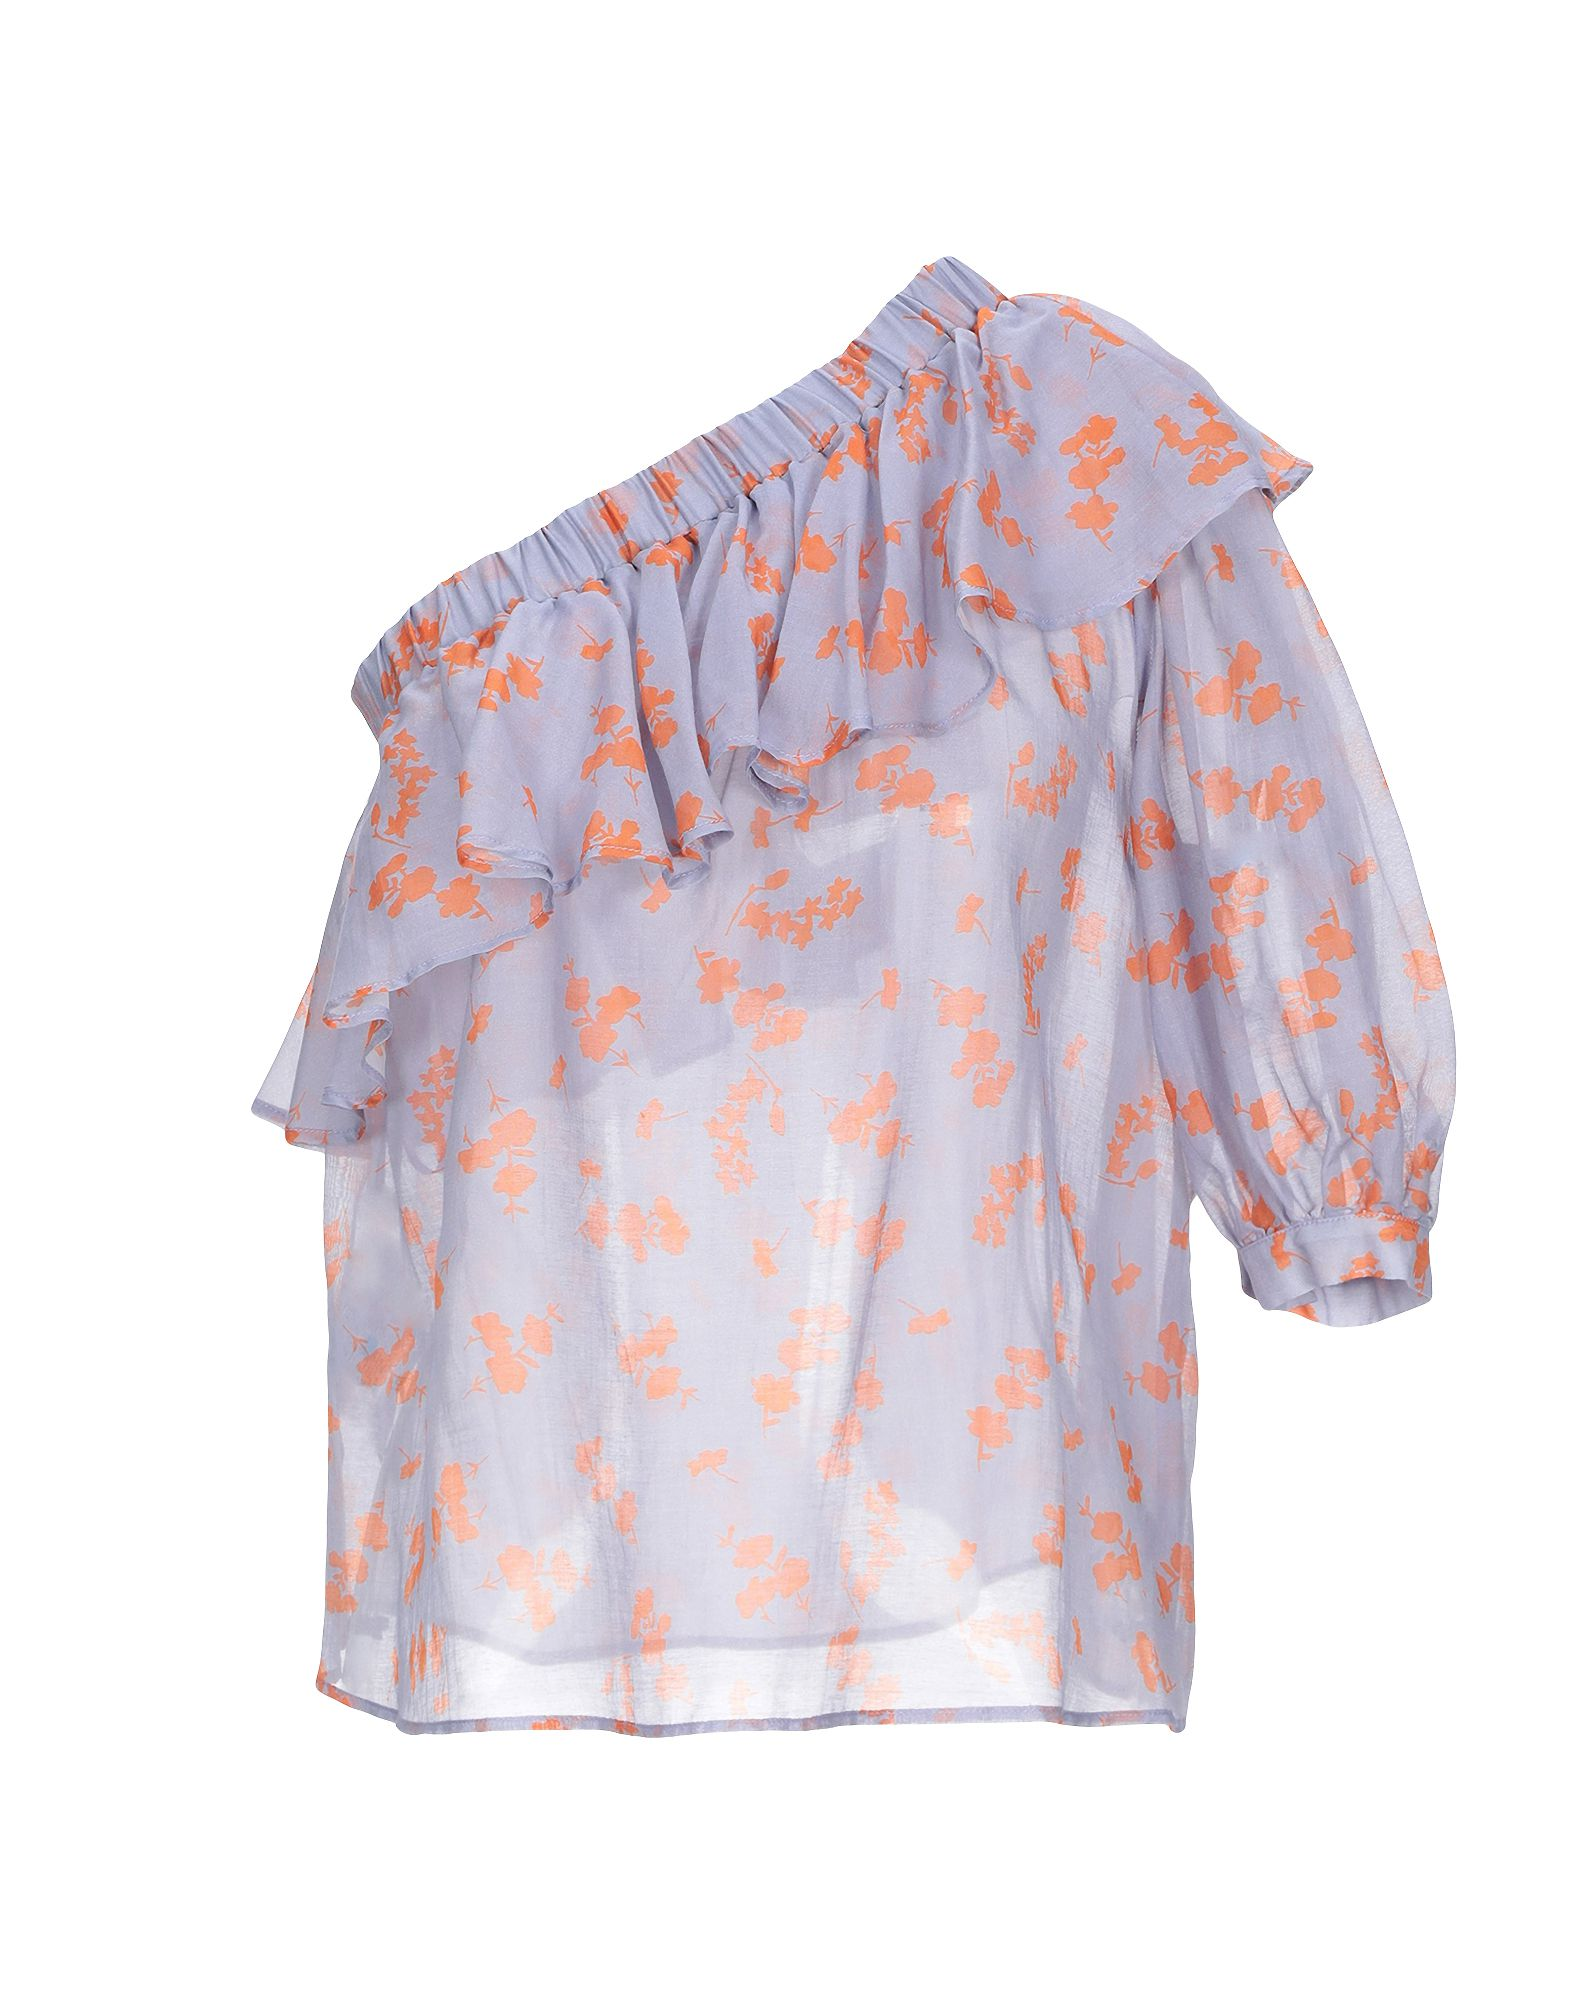 Фото - ANNARITA N TWENTY 4H Блузка annarita n twenty 4h блузка